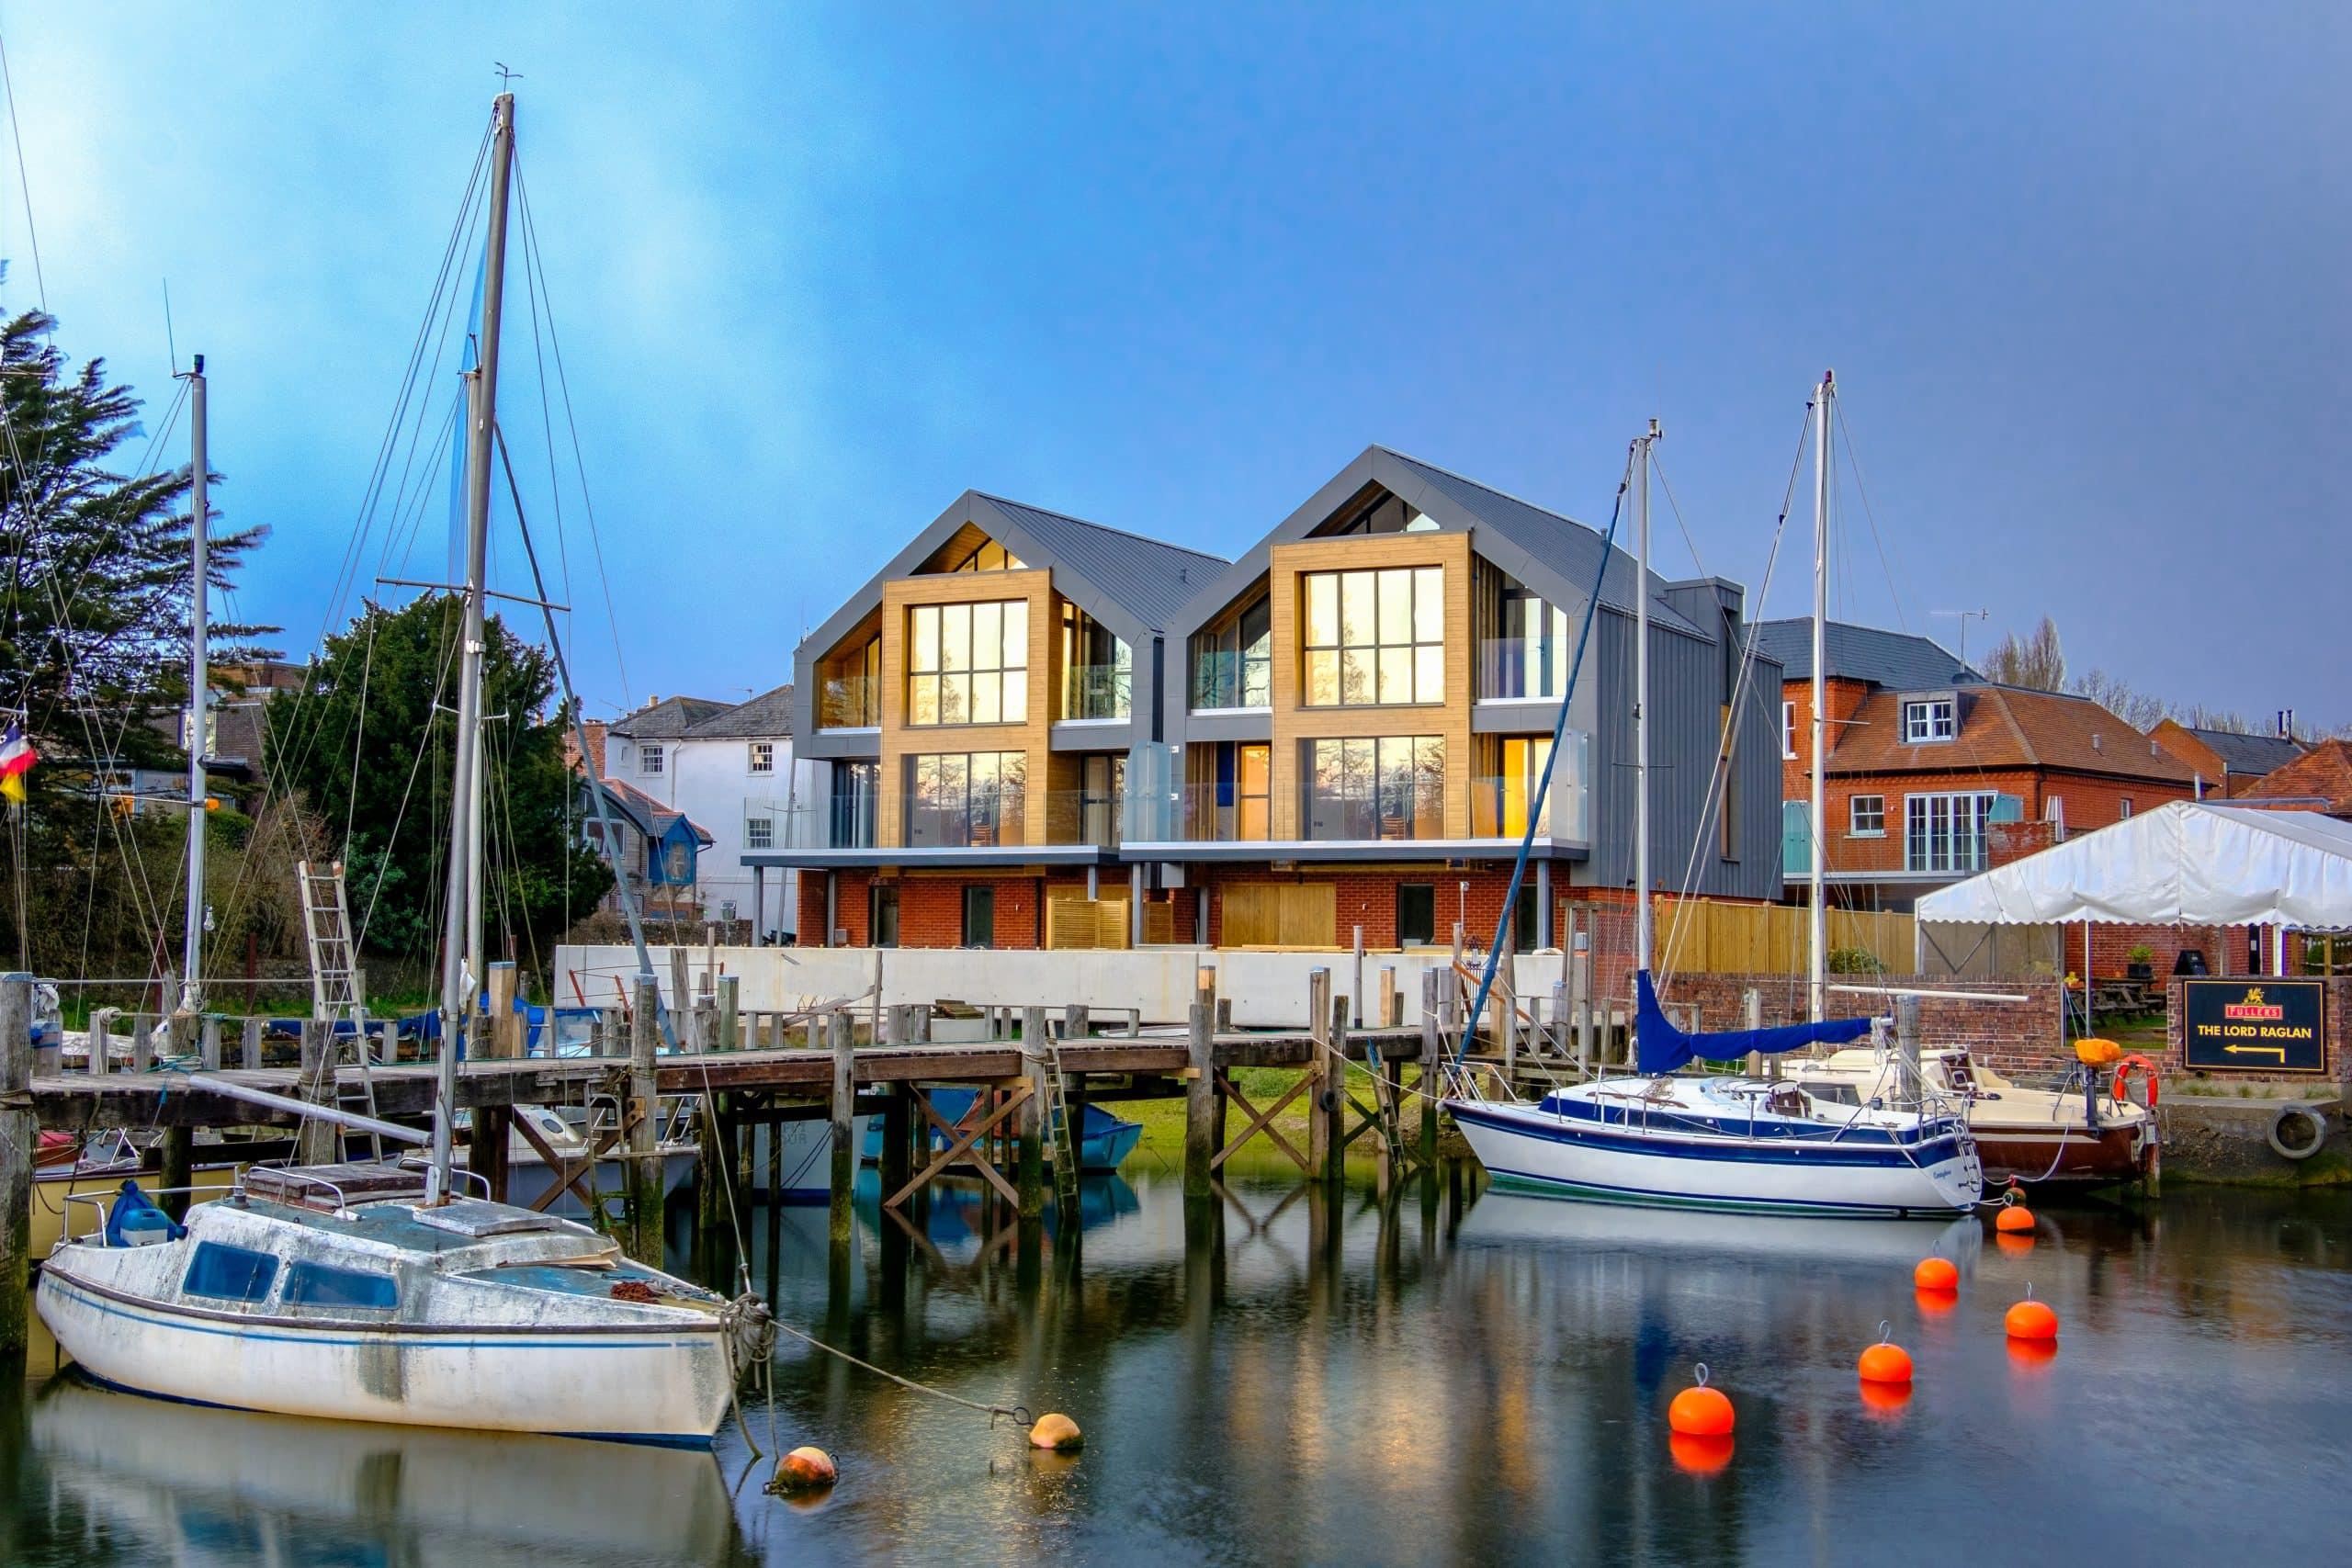 dolphin quays luxury coastal residential development with slim framed aluminium glazing